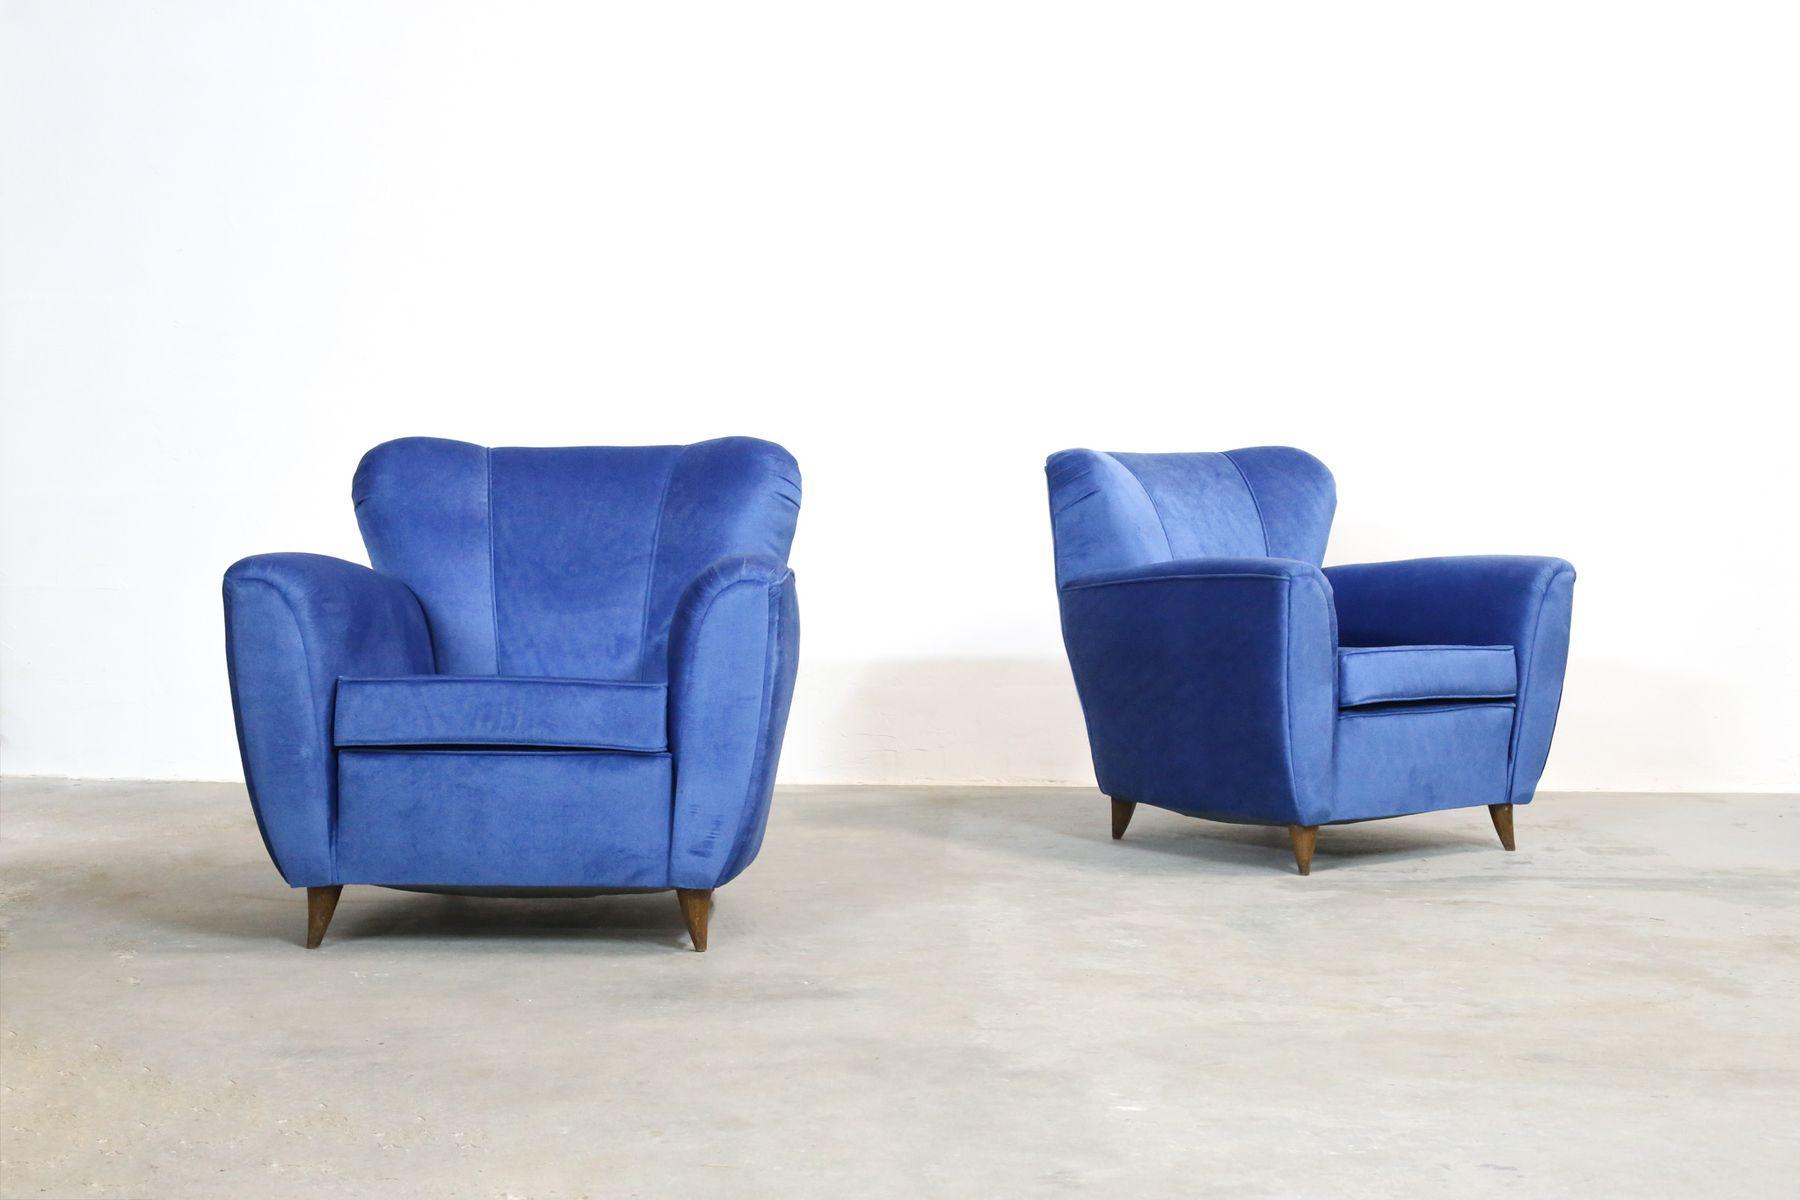 italienische blaue vintage sessel 1960er 2er set bei pamono kaufen. Black Bedroom Furniture Sets. Home Design Ideas